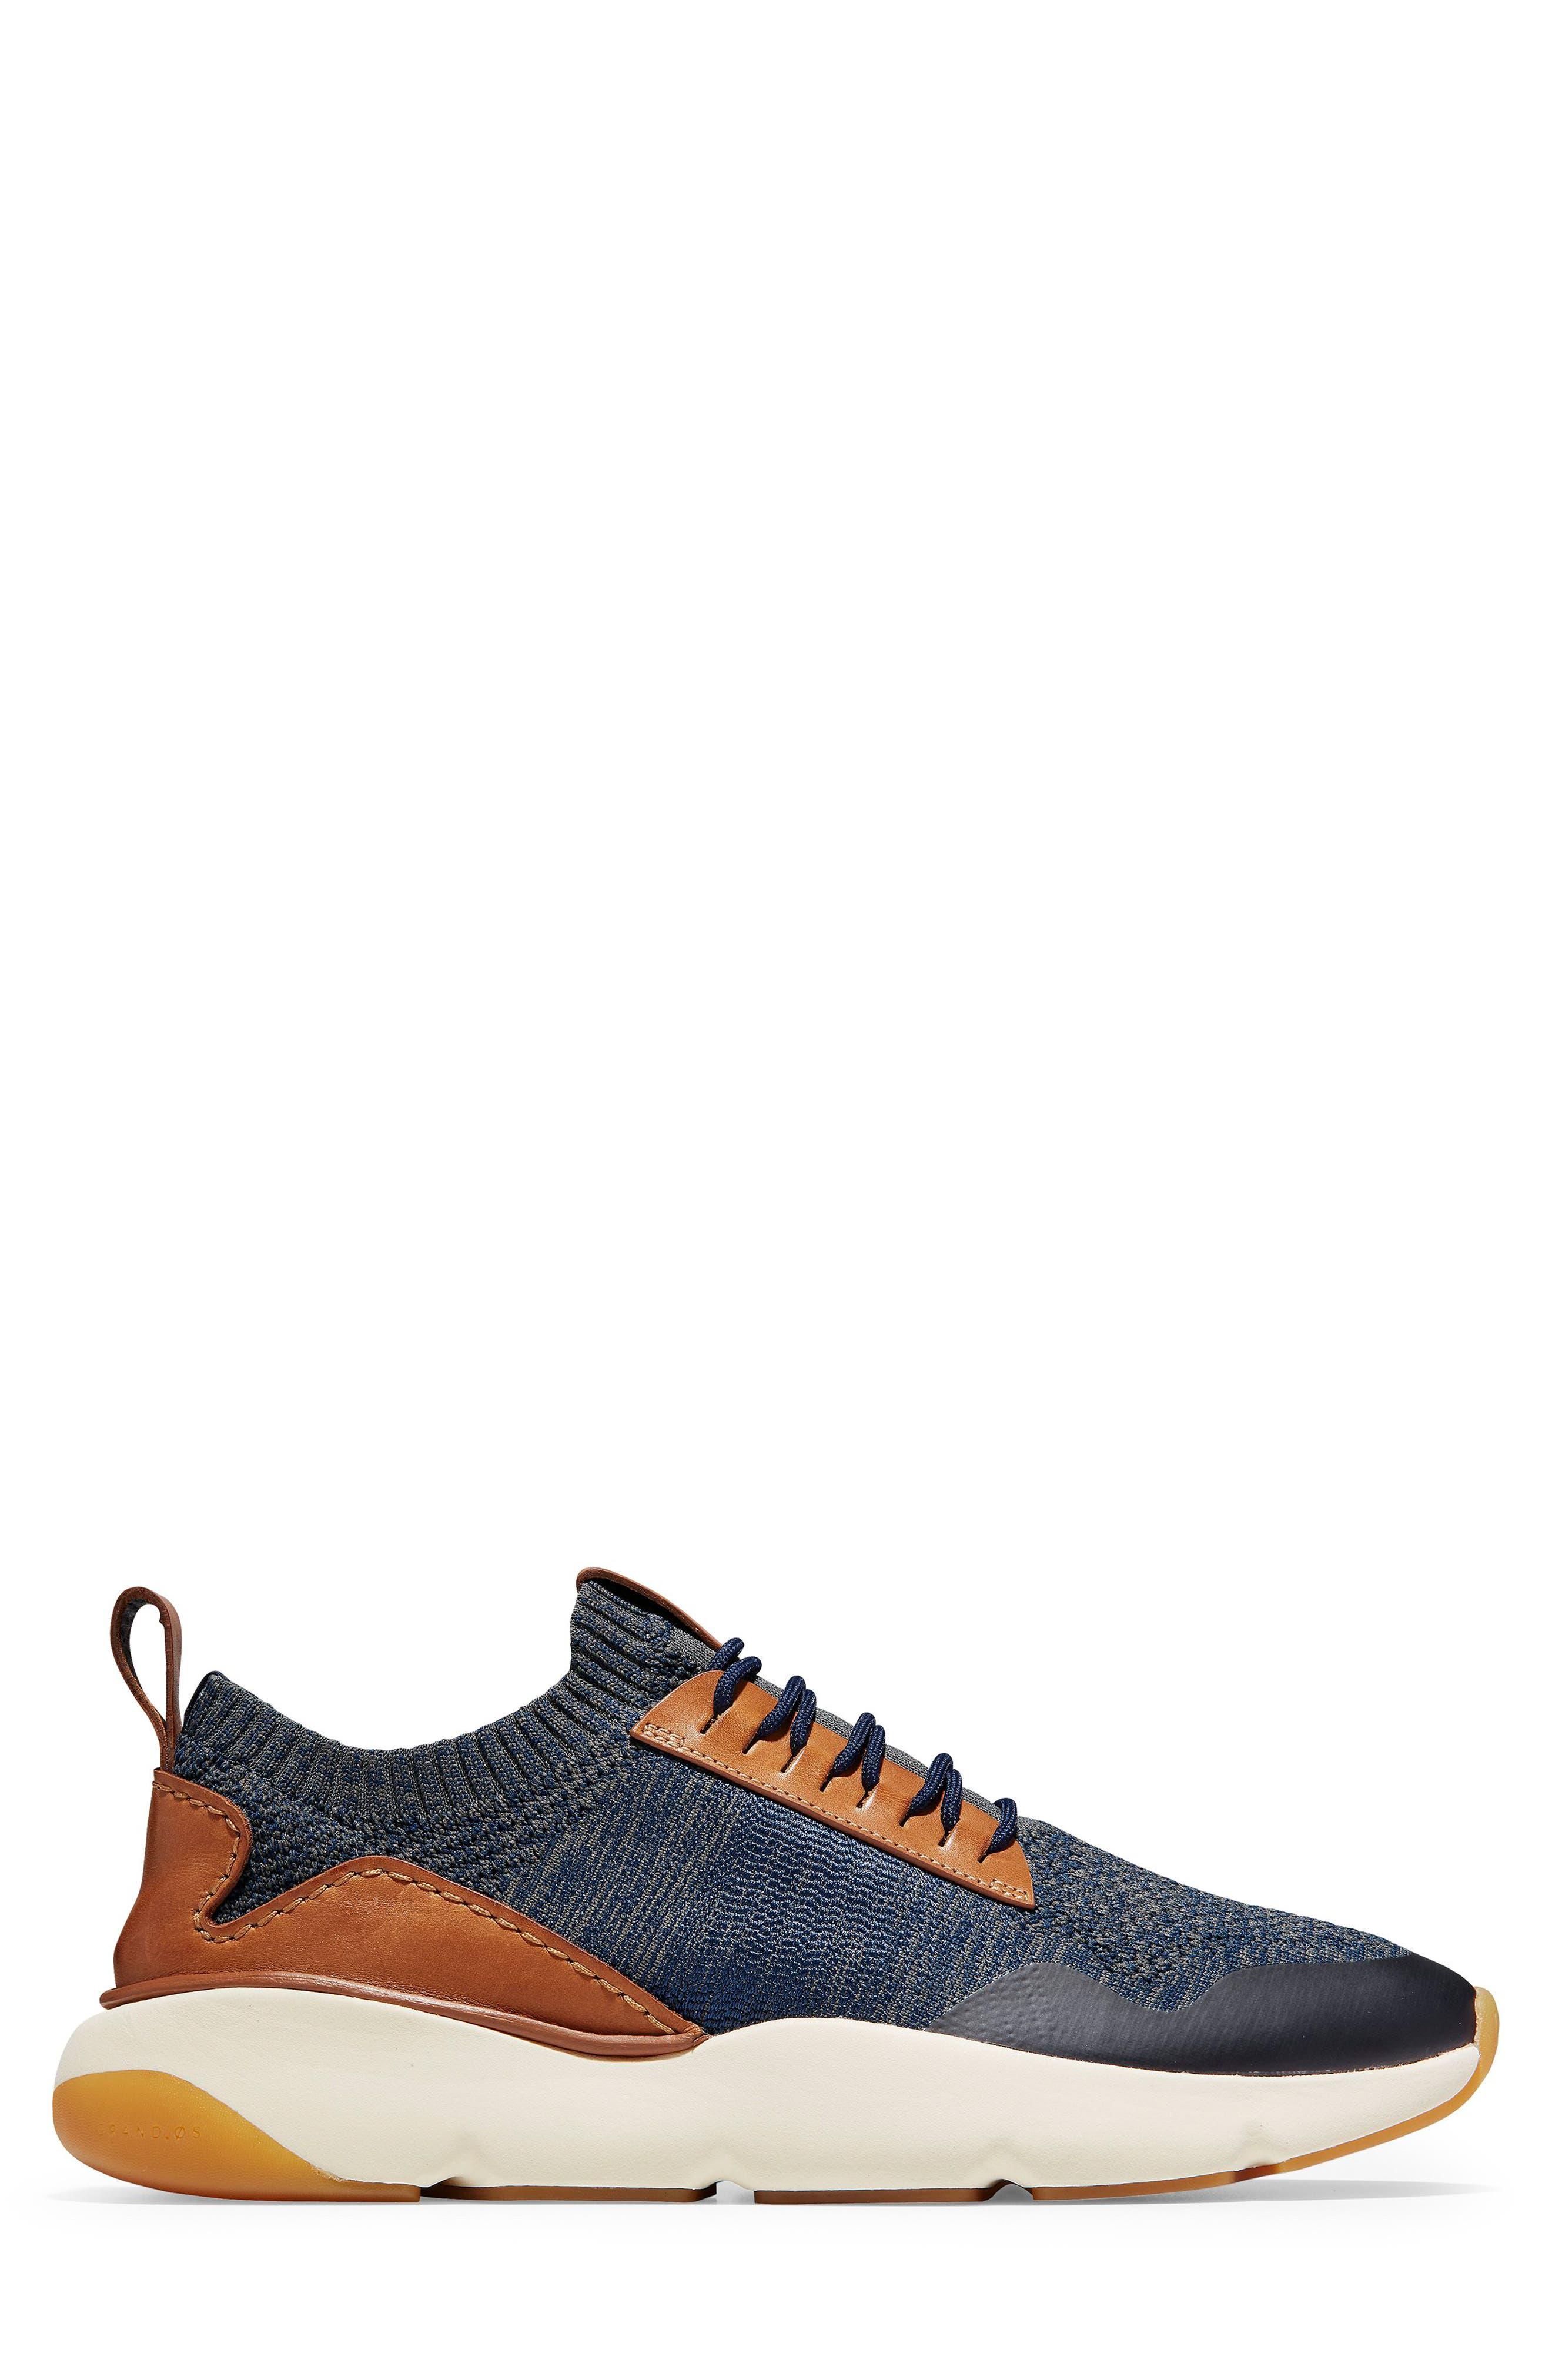 ZeroGrand All-Day Trainer Sneaker,                             Alternate thumbnail 3, color,                             MARINE BLUE/ TAN KNIT